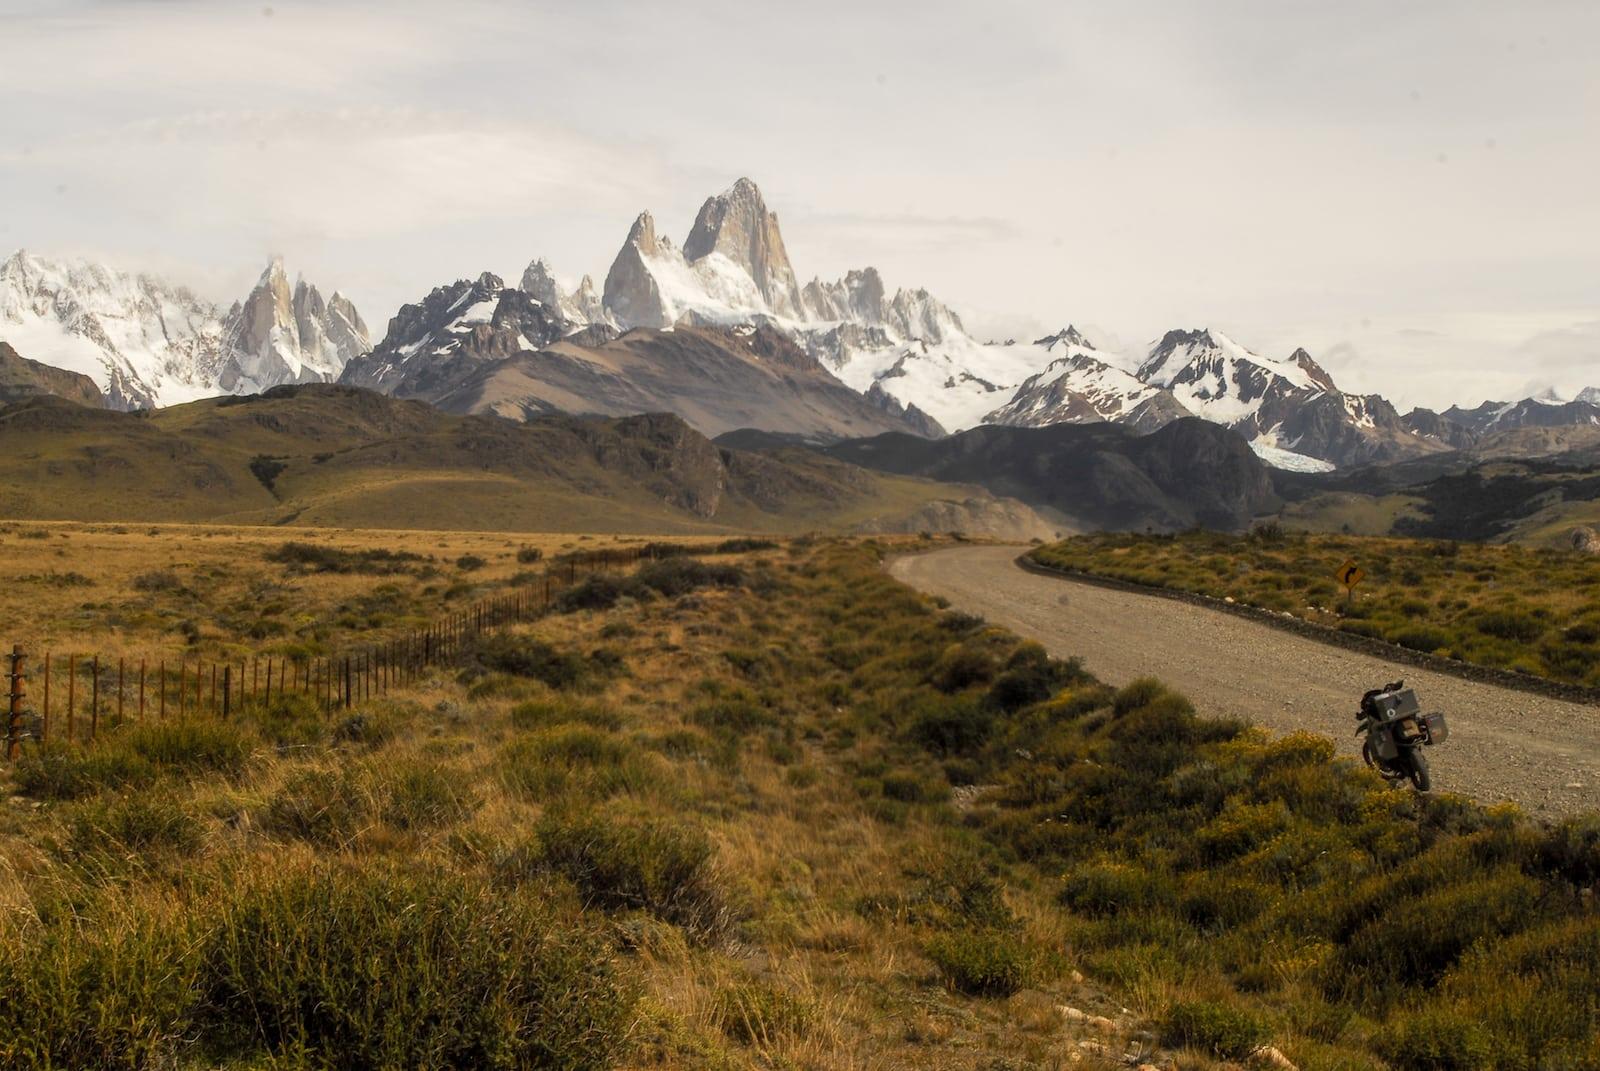 El Chalten, Argentina. 275 kms